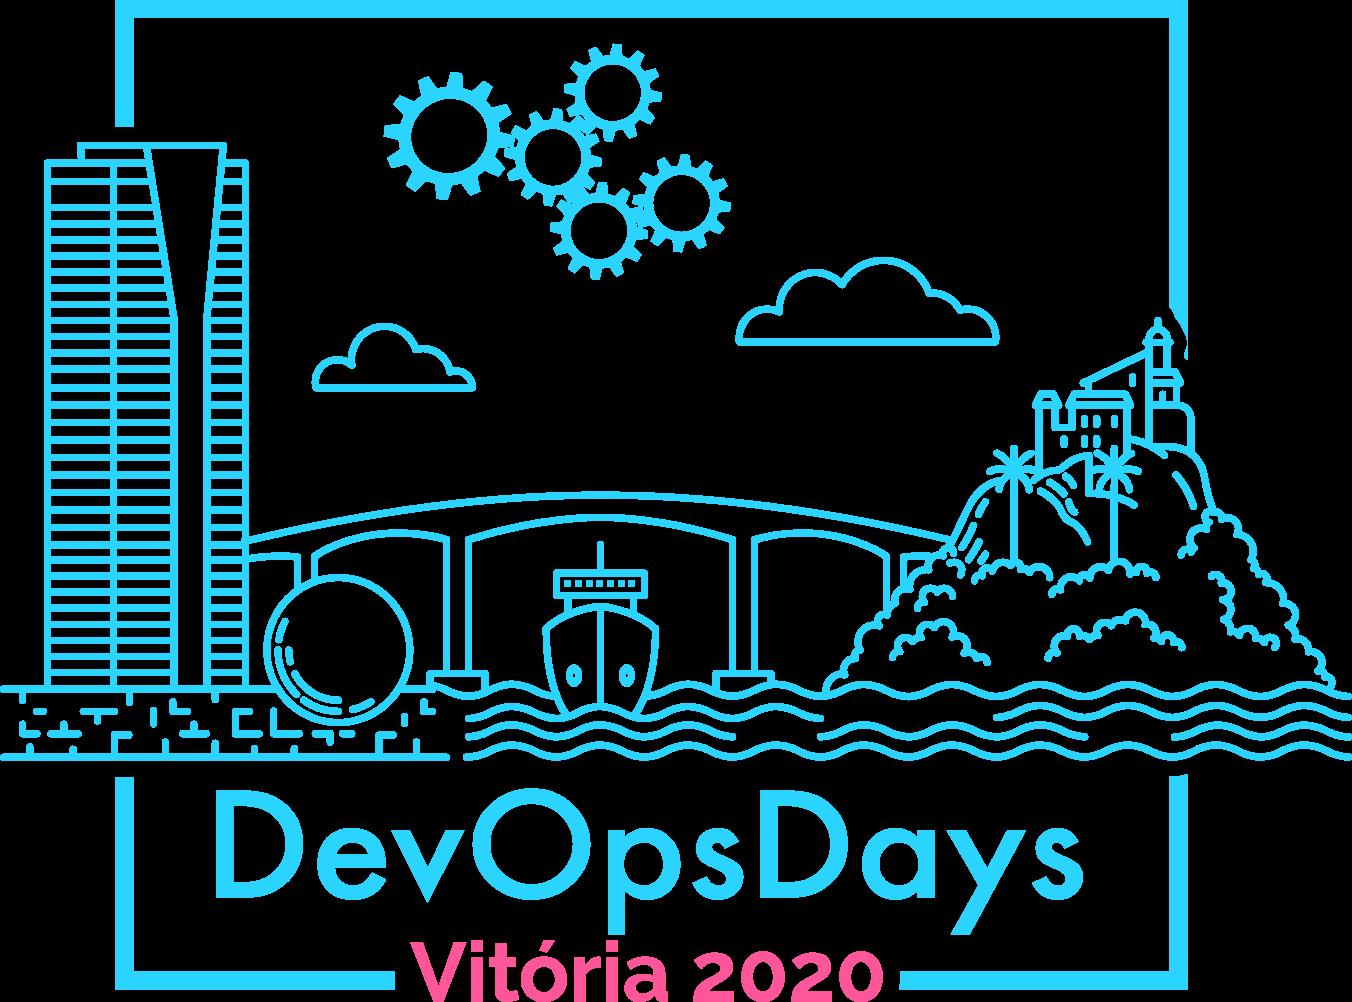 DevOpsDays vitoria 2020